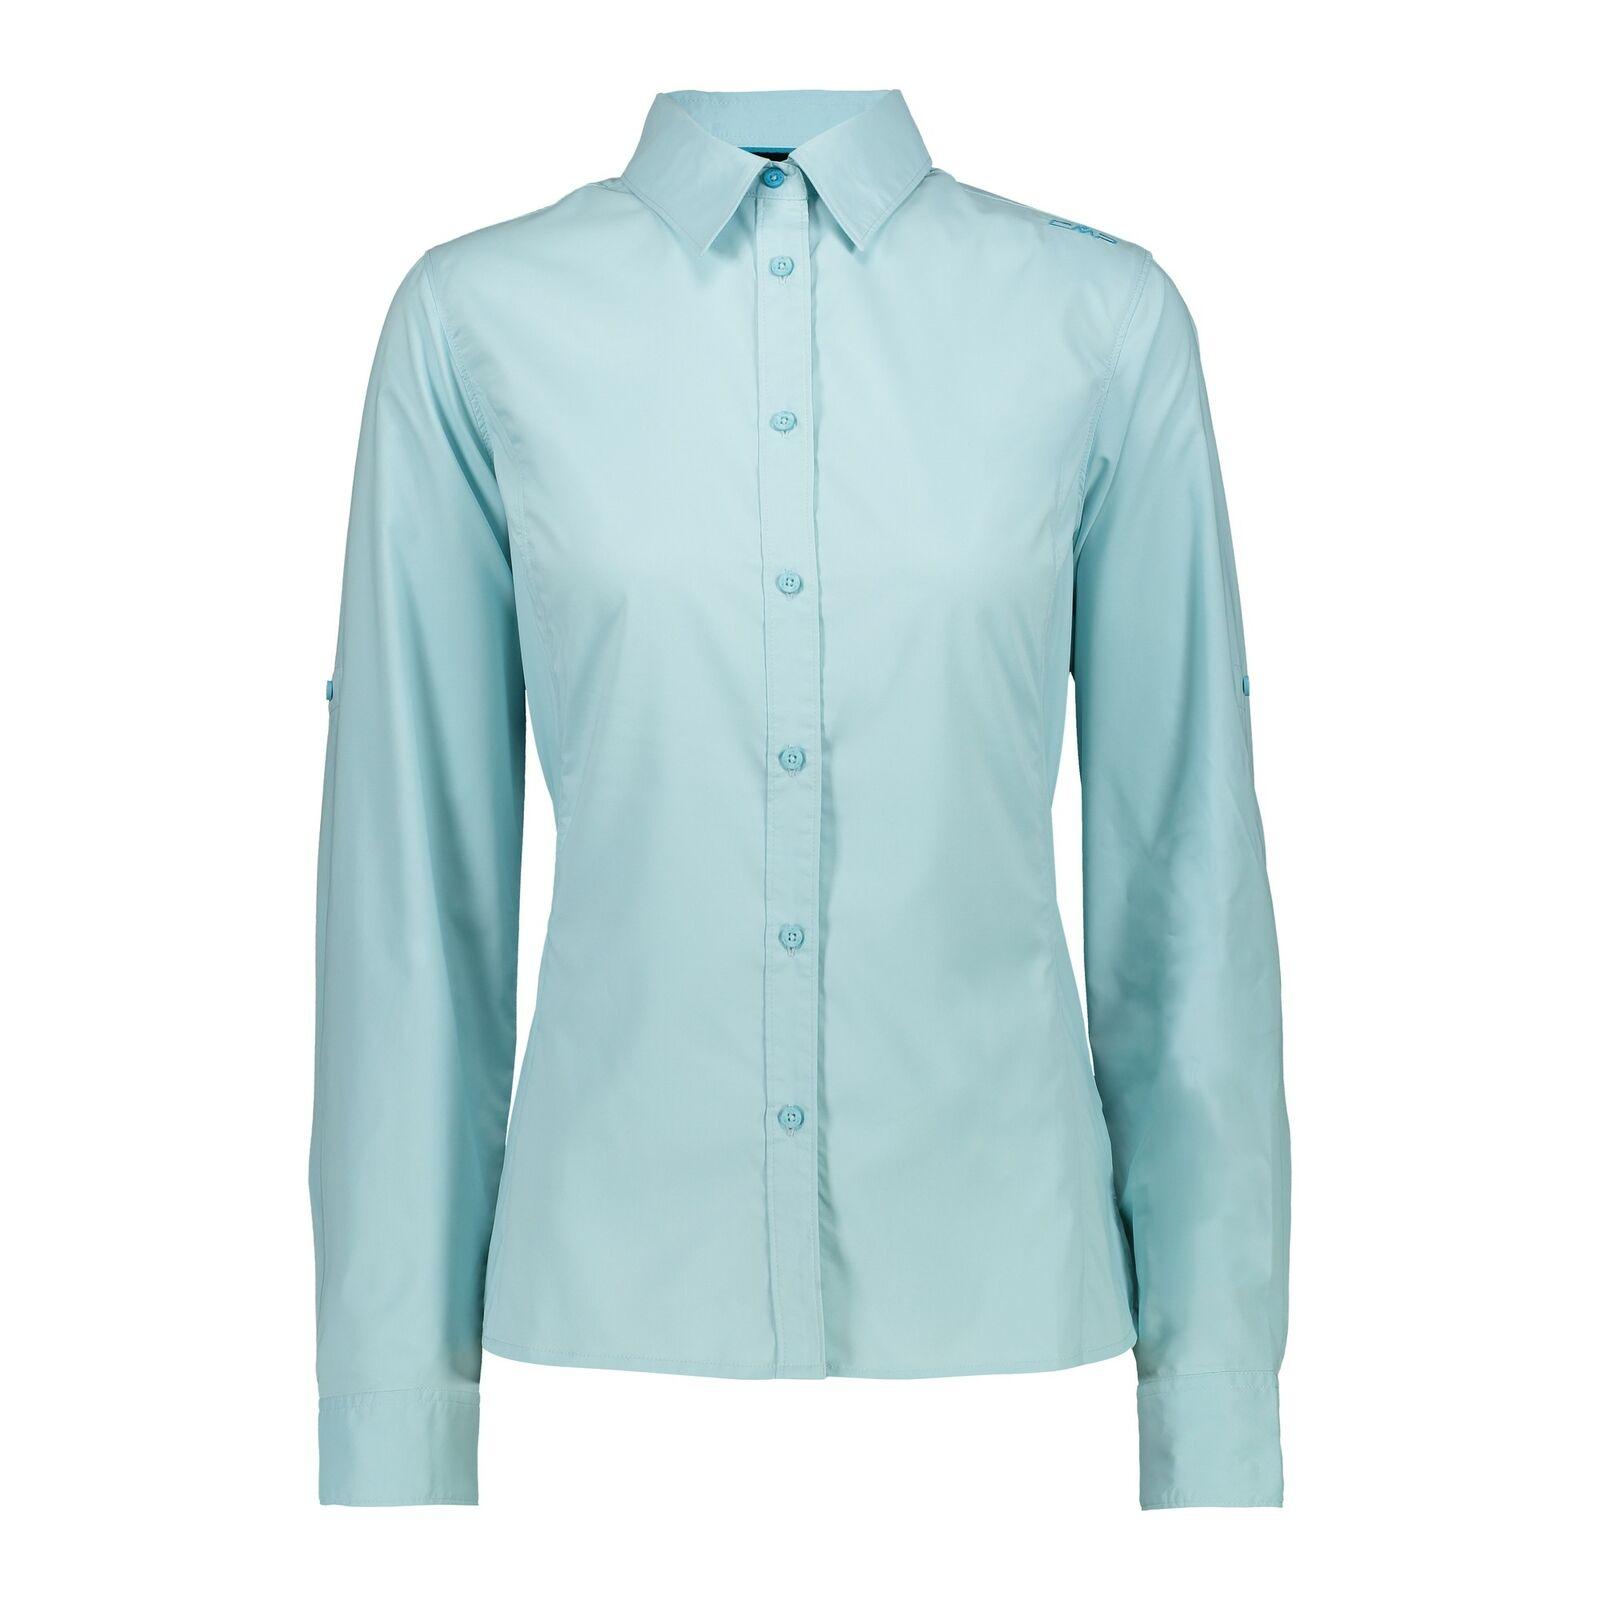 CMP  bluese Woman Shirt hellblue atmungsaktiv elastisch UV-Schutz Unifarben  free shipping & exchanges.